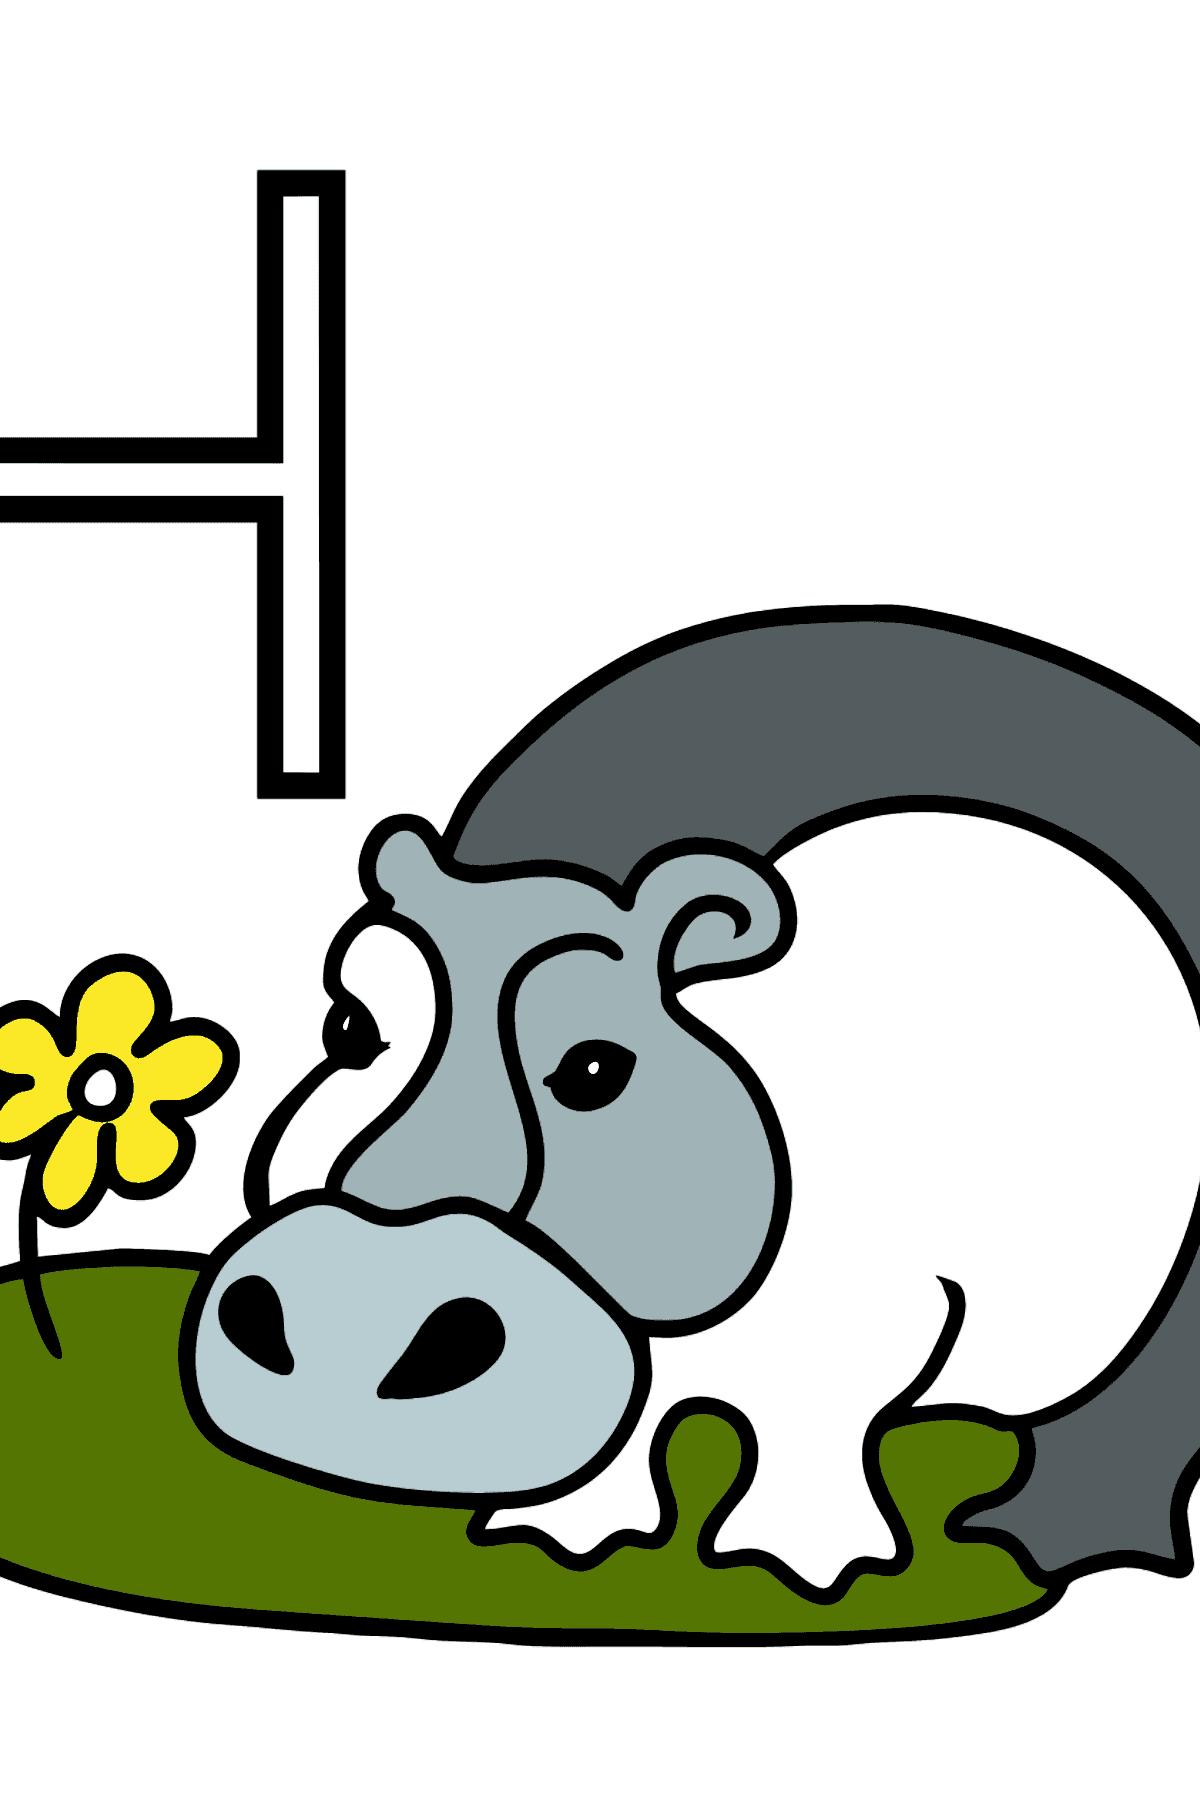 Spanish Letter H coloring pages - HIPOPÓTAMO - Coloring Pages for Kids